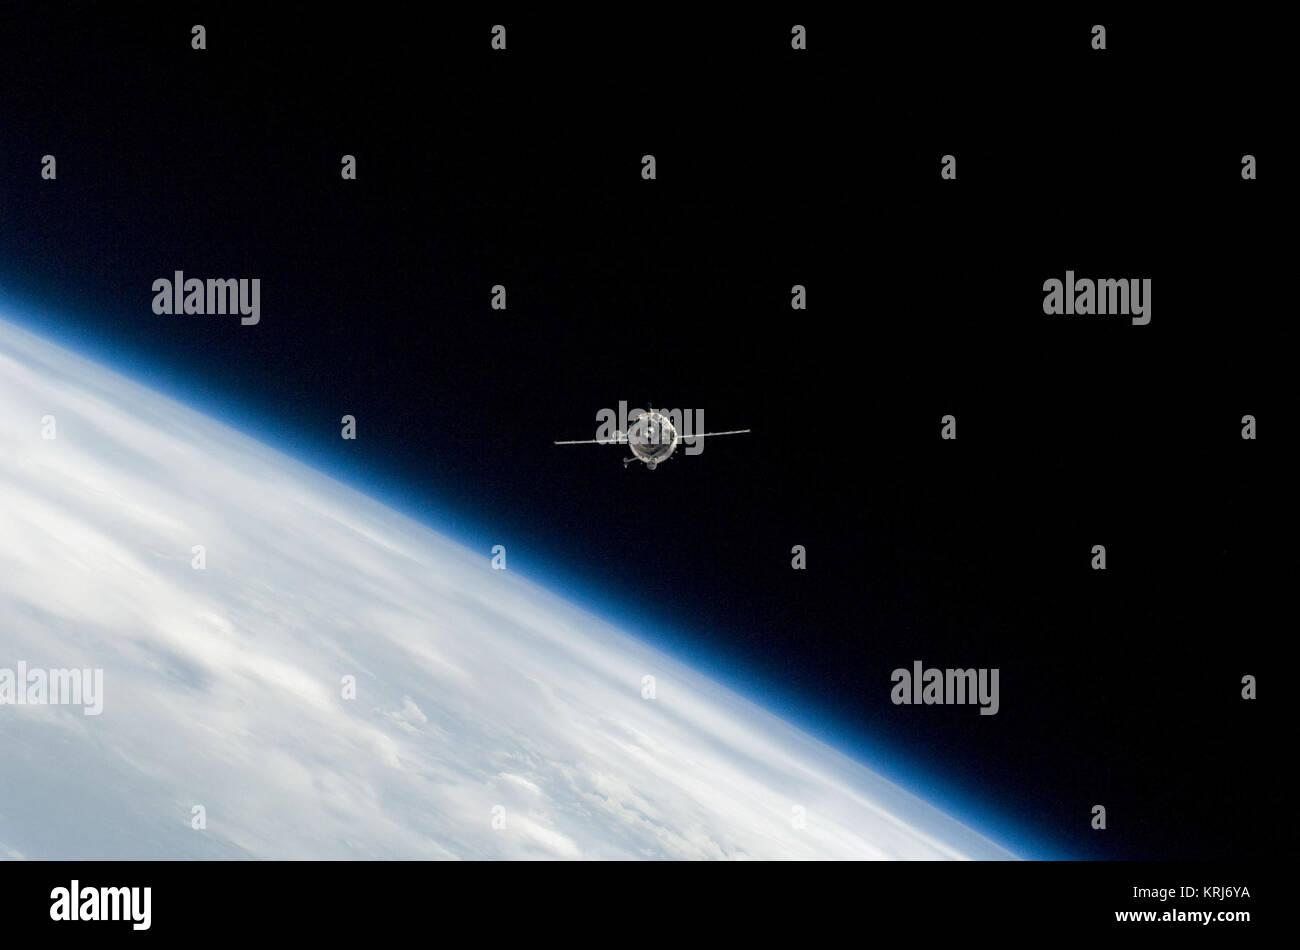 Soyuz TMA-14 cosmos - Stock Image